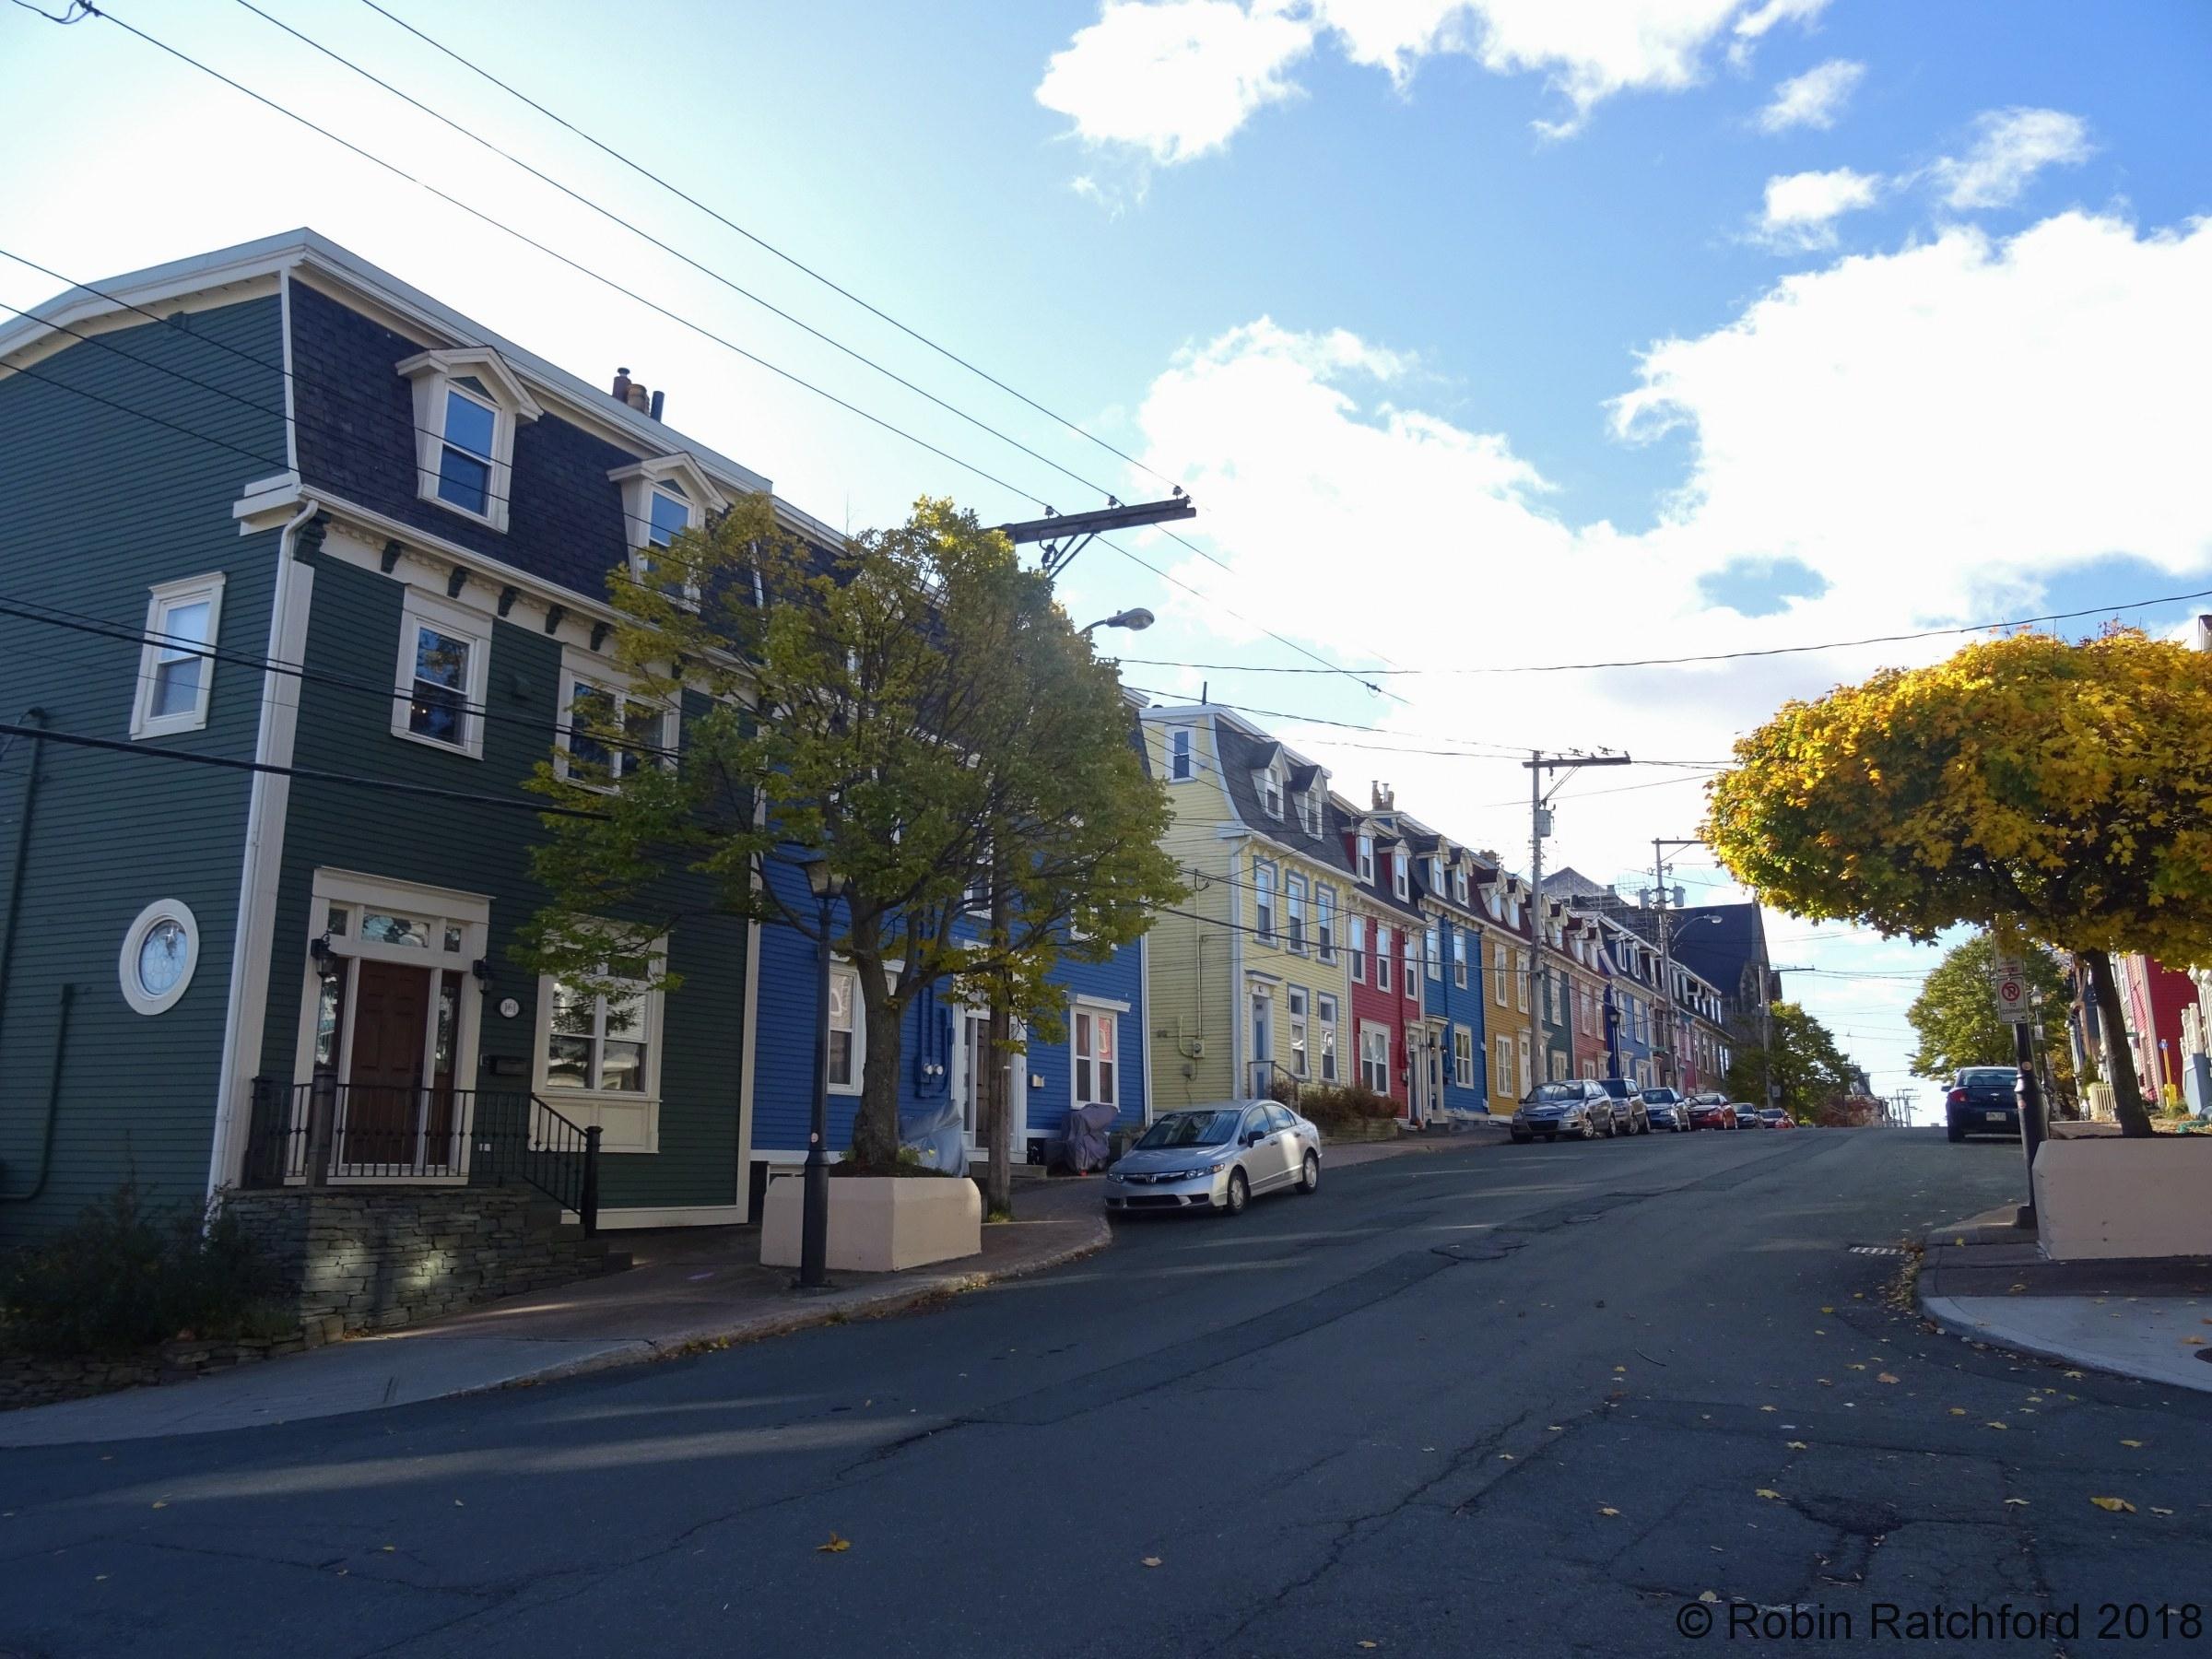 St John's - Street View